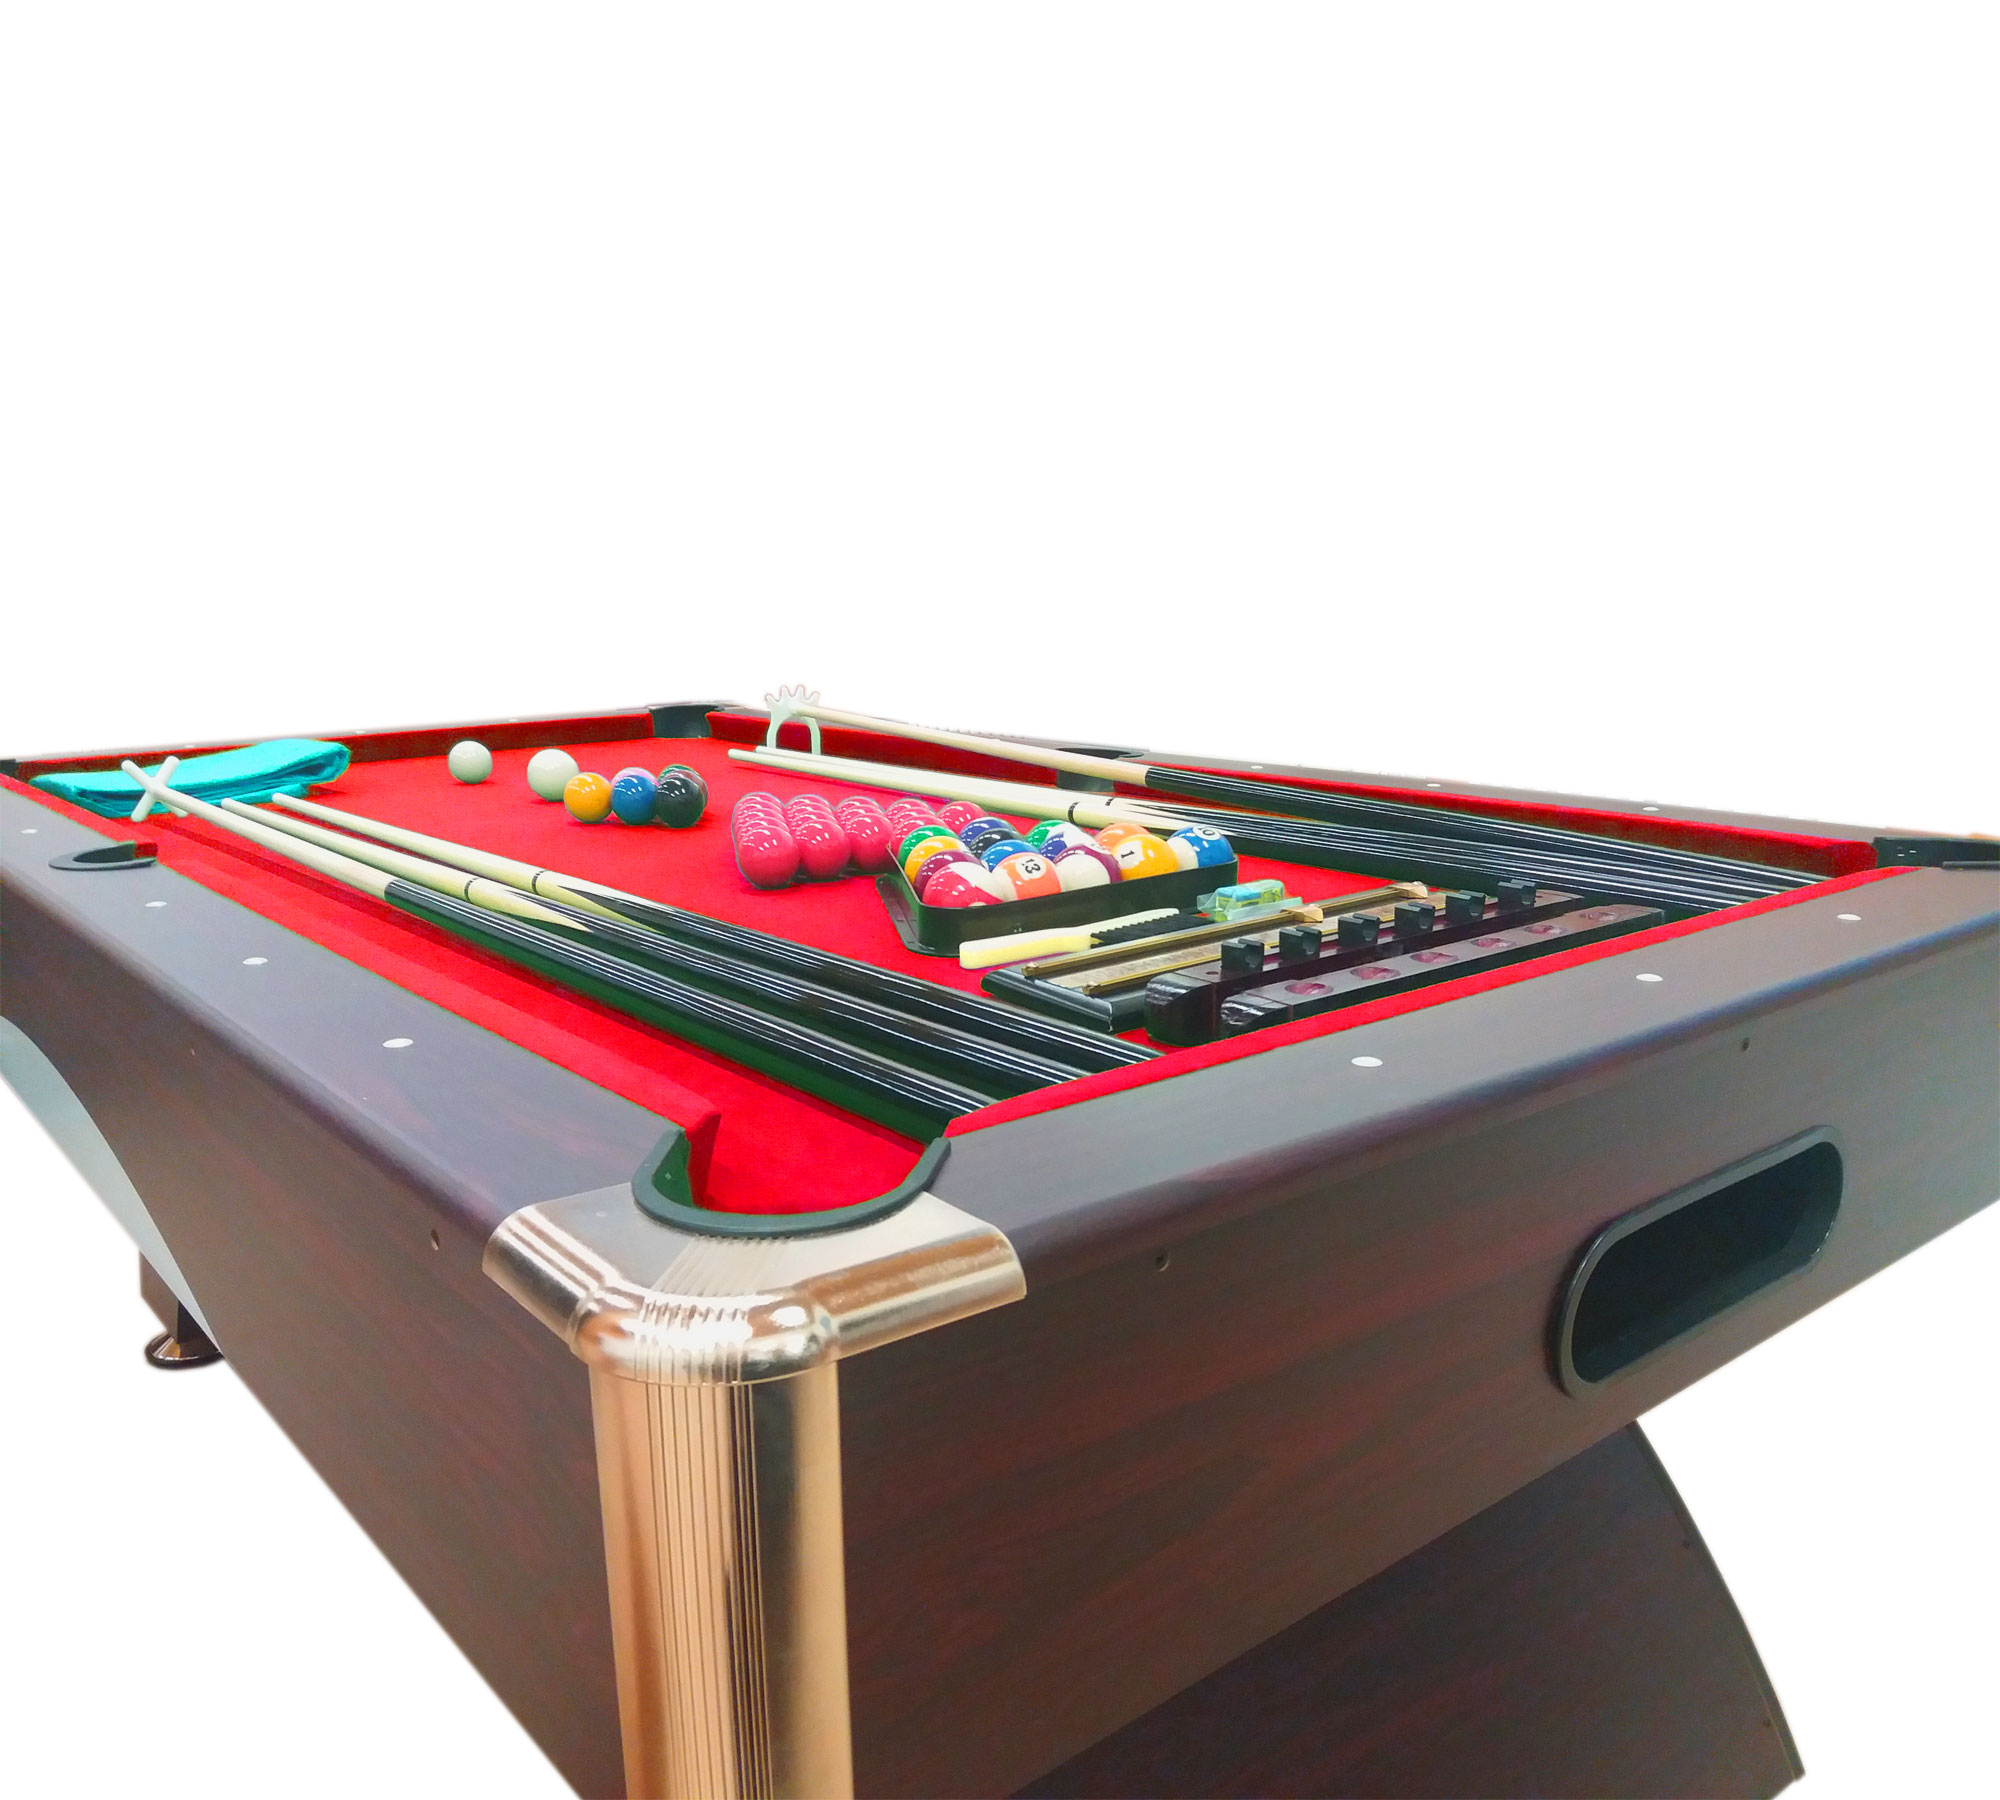 Mesa de billar juegos de billar pool 7 ft carambola full for Mesa de billar profesional